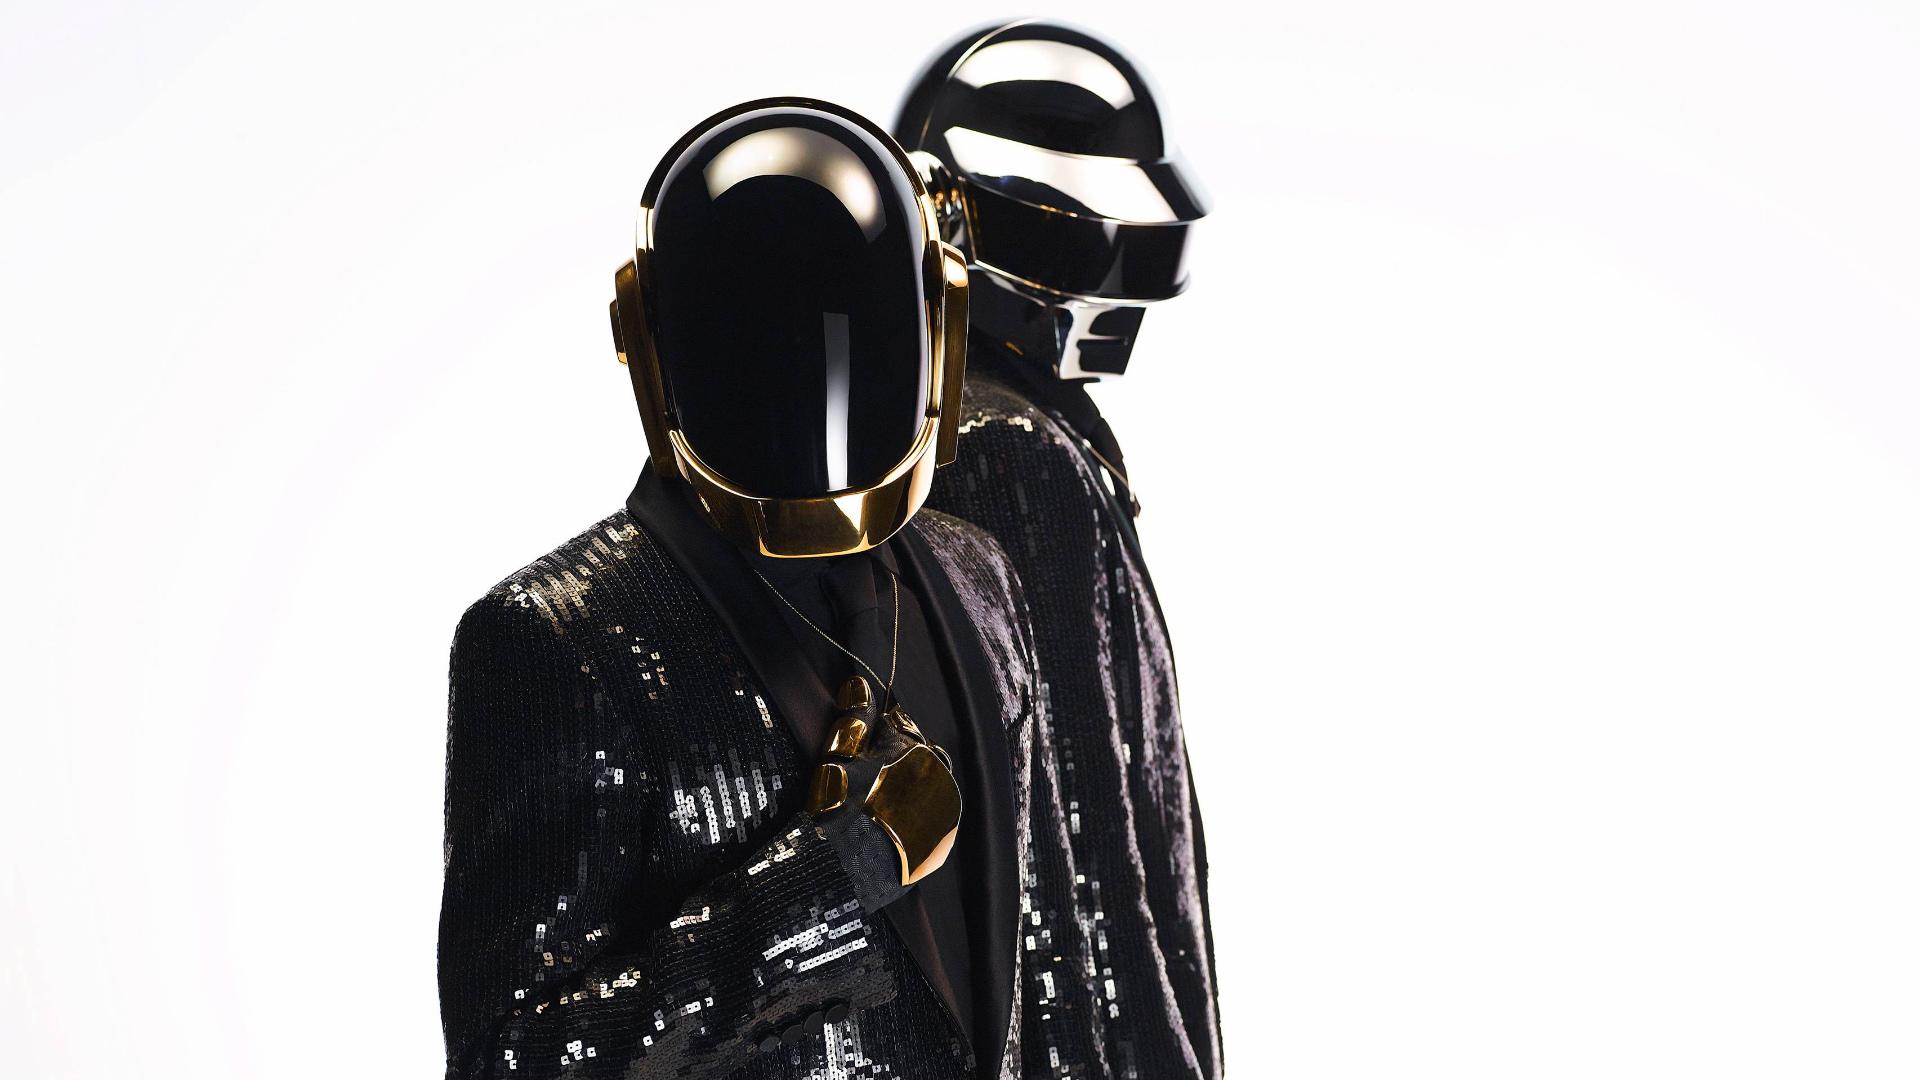 Daft Punk | Music fanart | fanart.tv